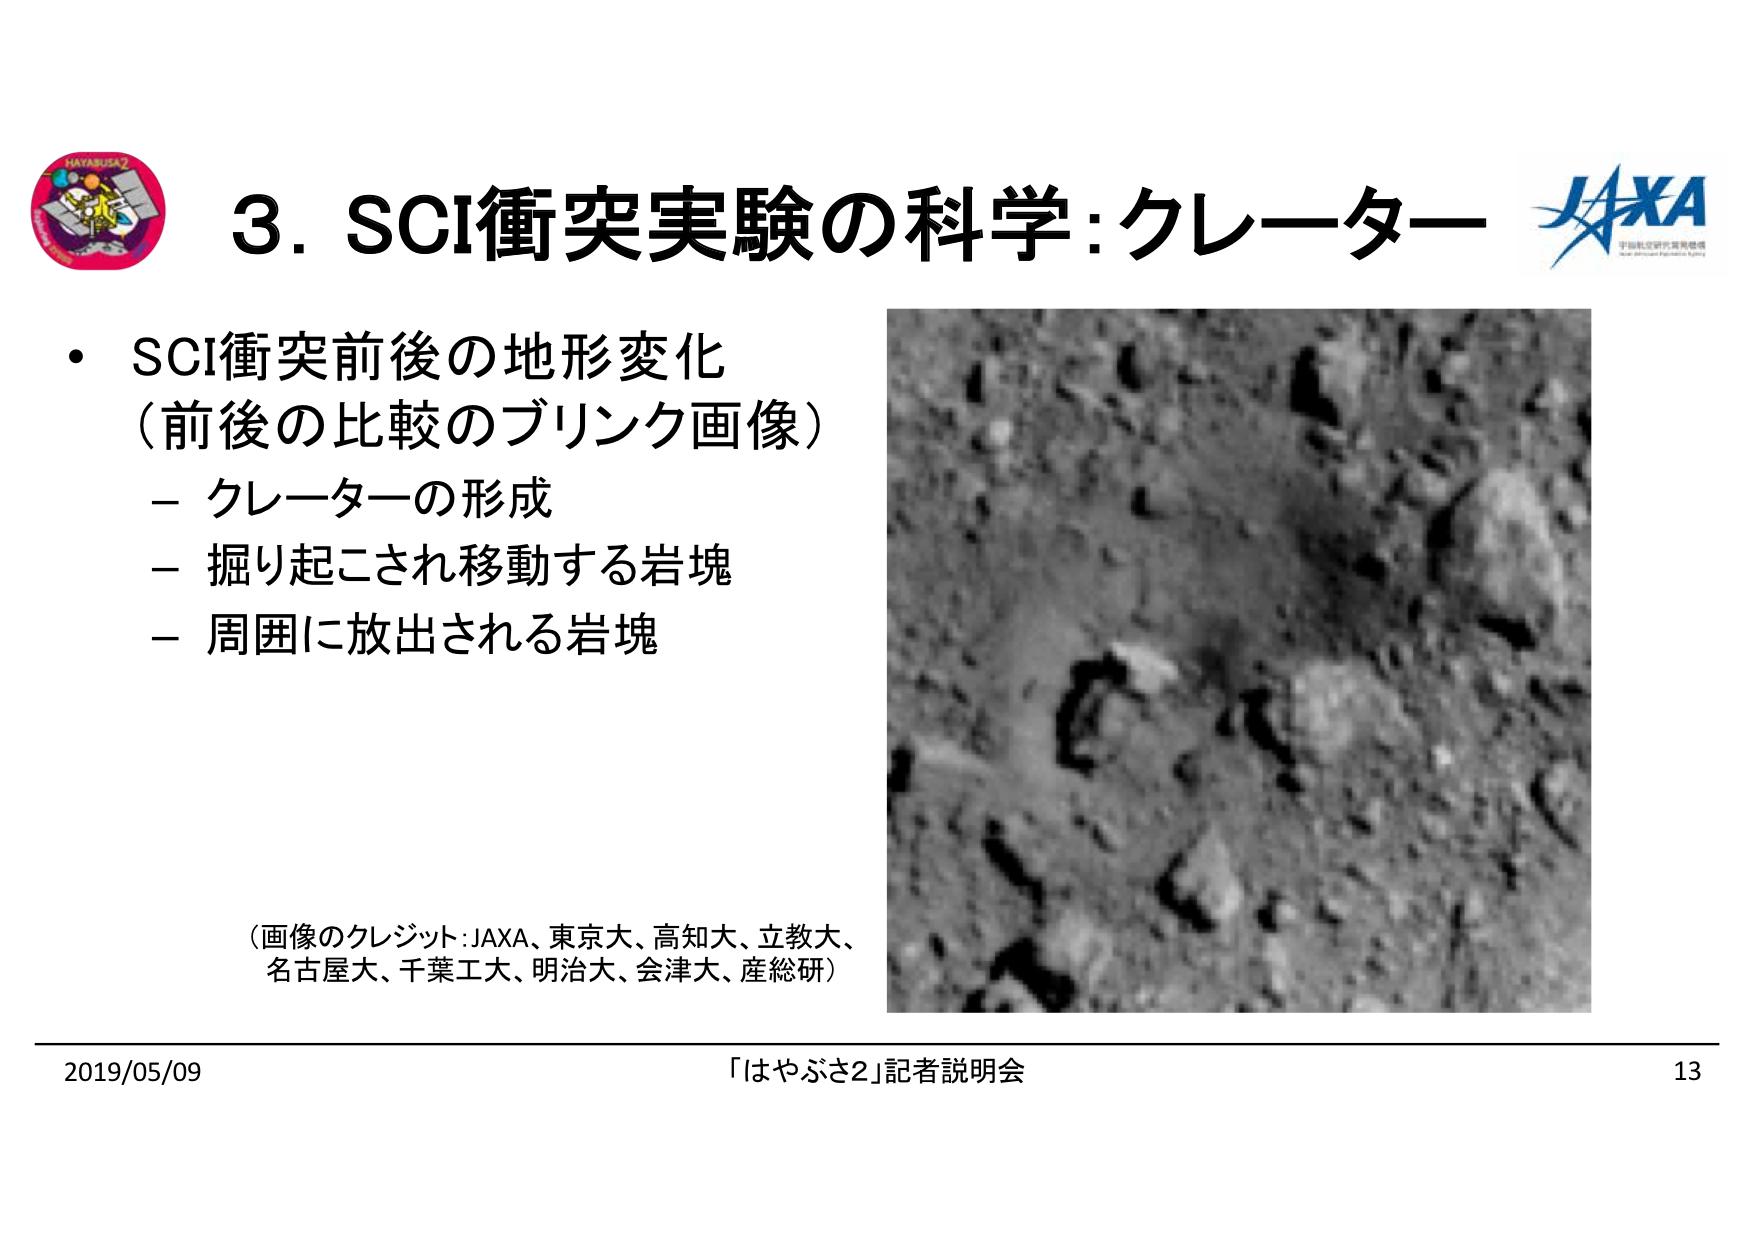 f:id:Imamura:20190509154409p:plain